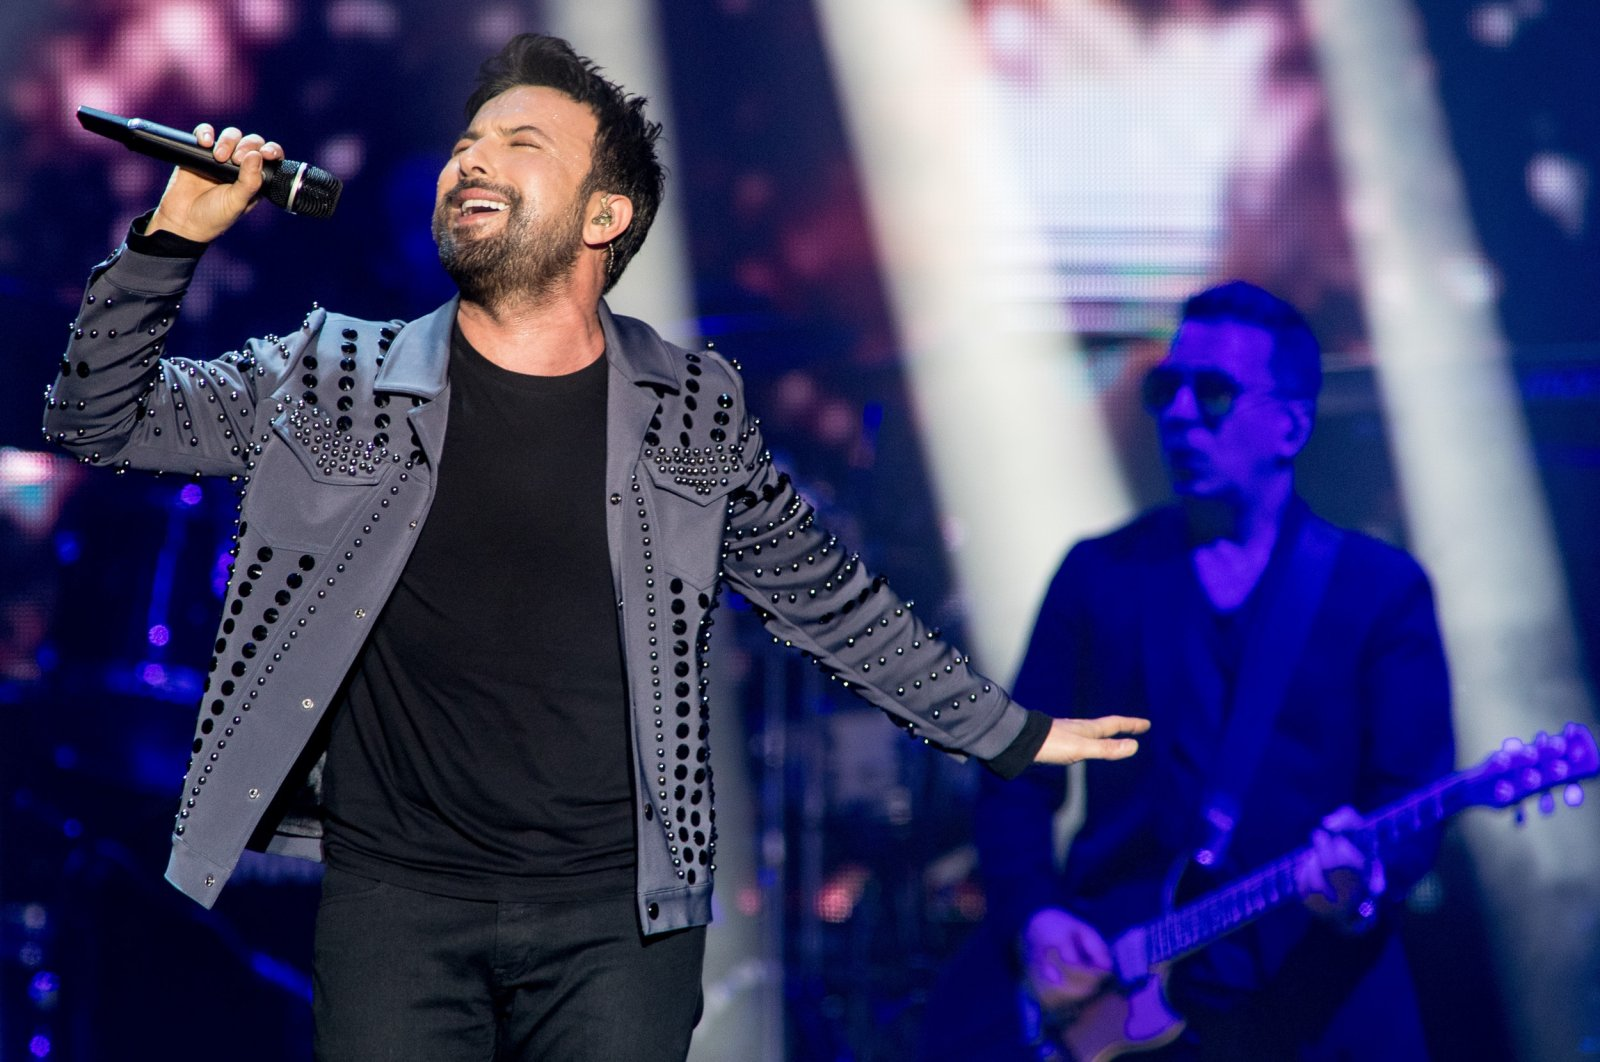 Turkish pop singer Tarkan performs at Afas Live, Amsterdam, Netherlands, November 14, 2019. (Getty Images)